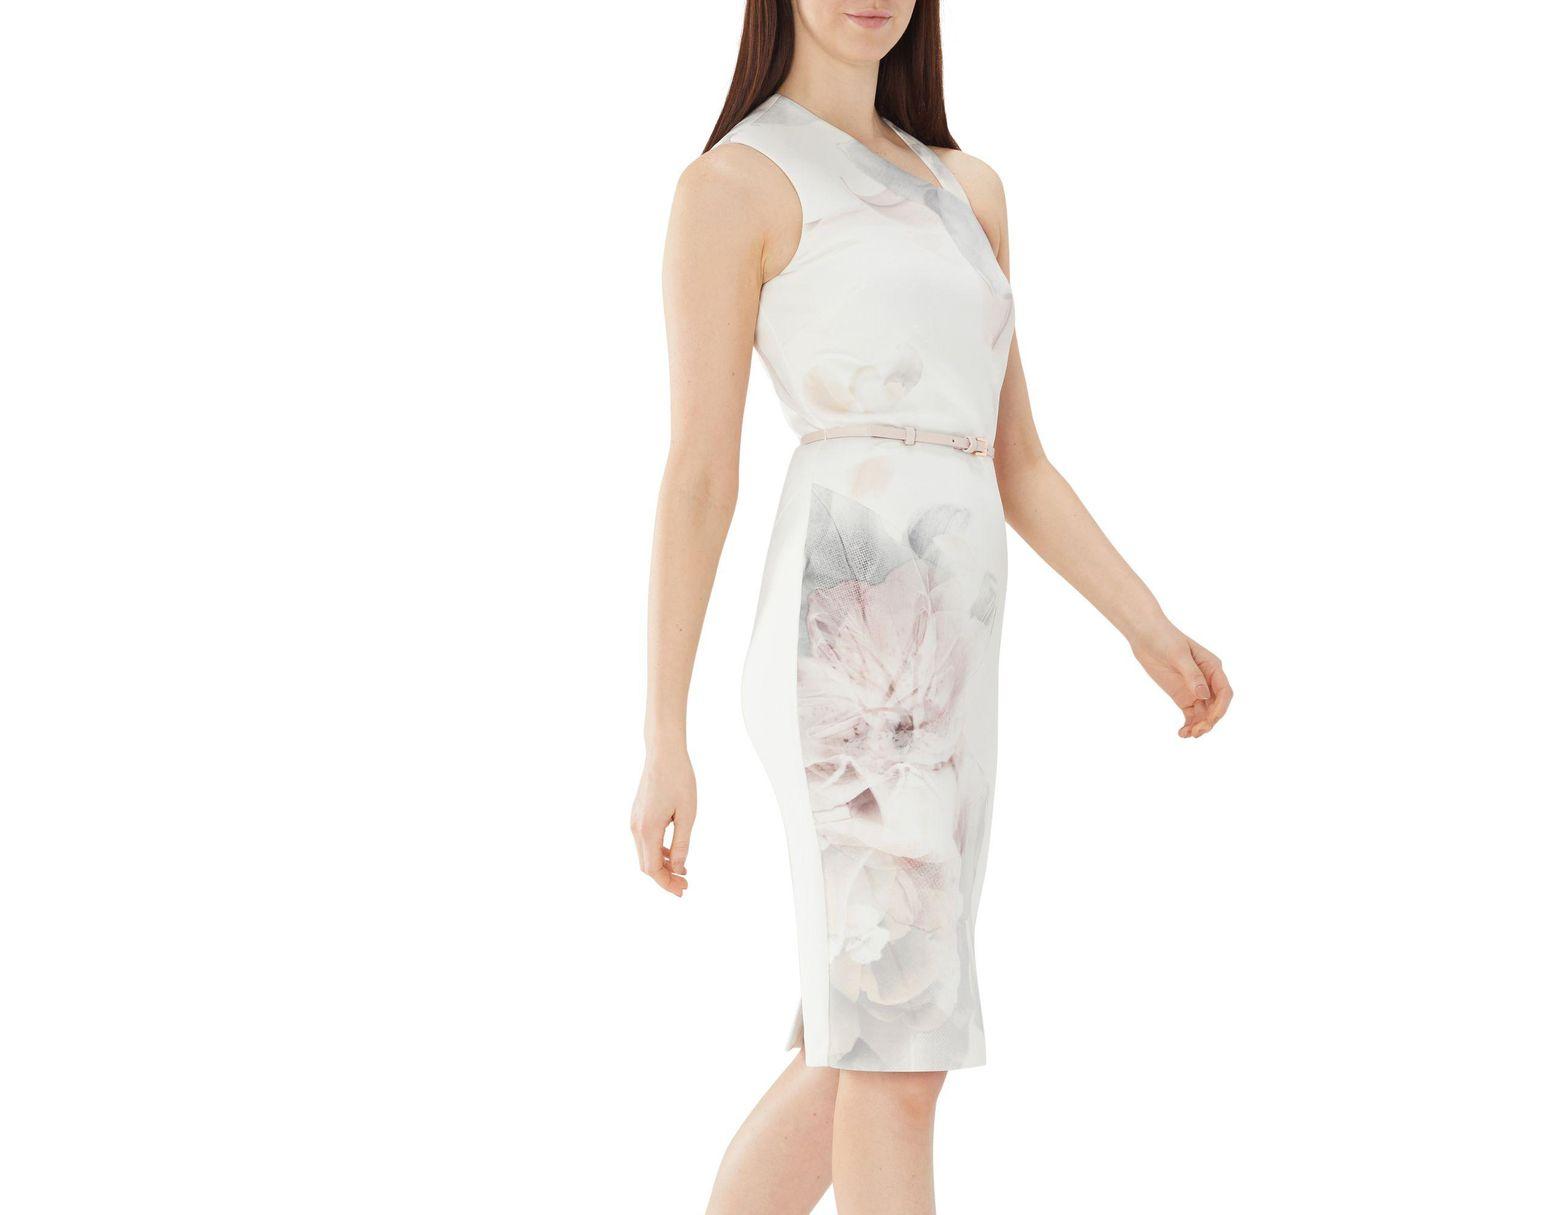 c5951eab22f Coast Floral Print  tara  Belted Shift Dress in White - Lyst